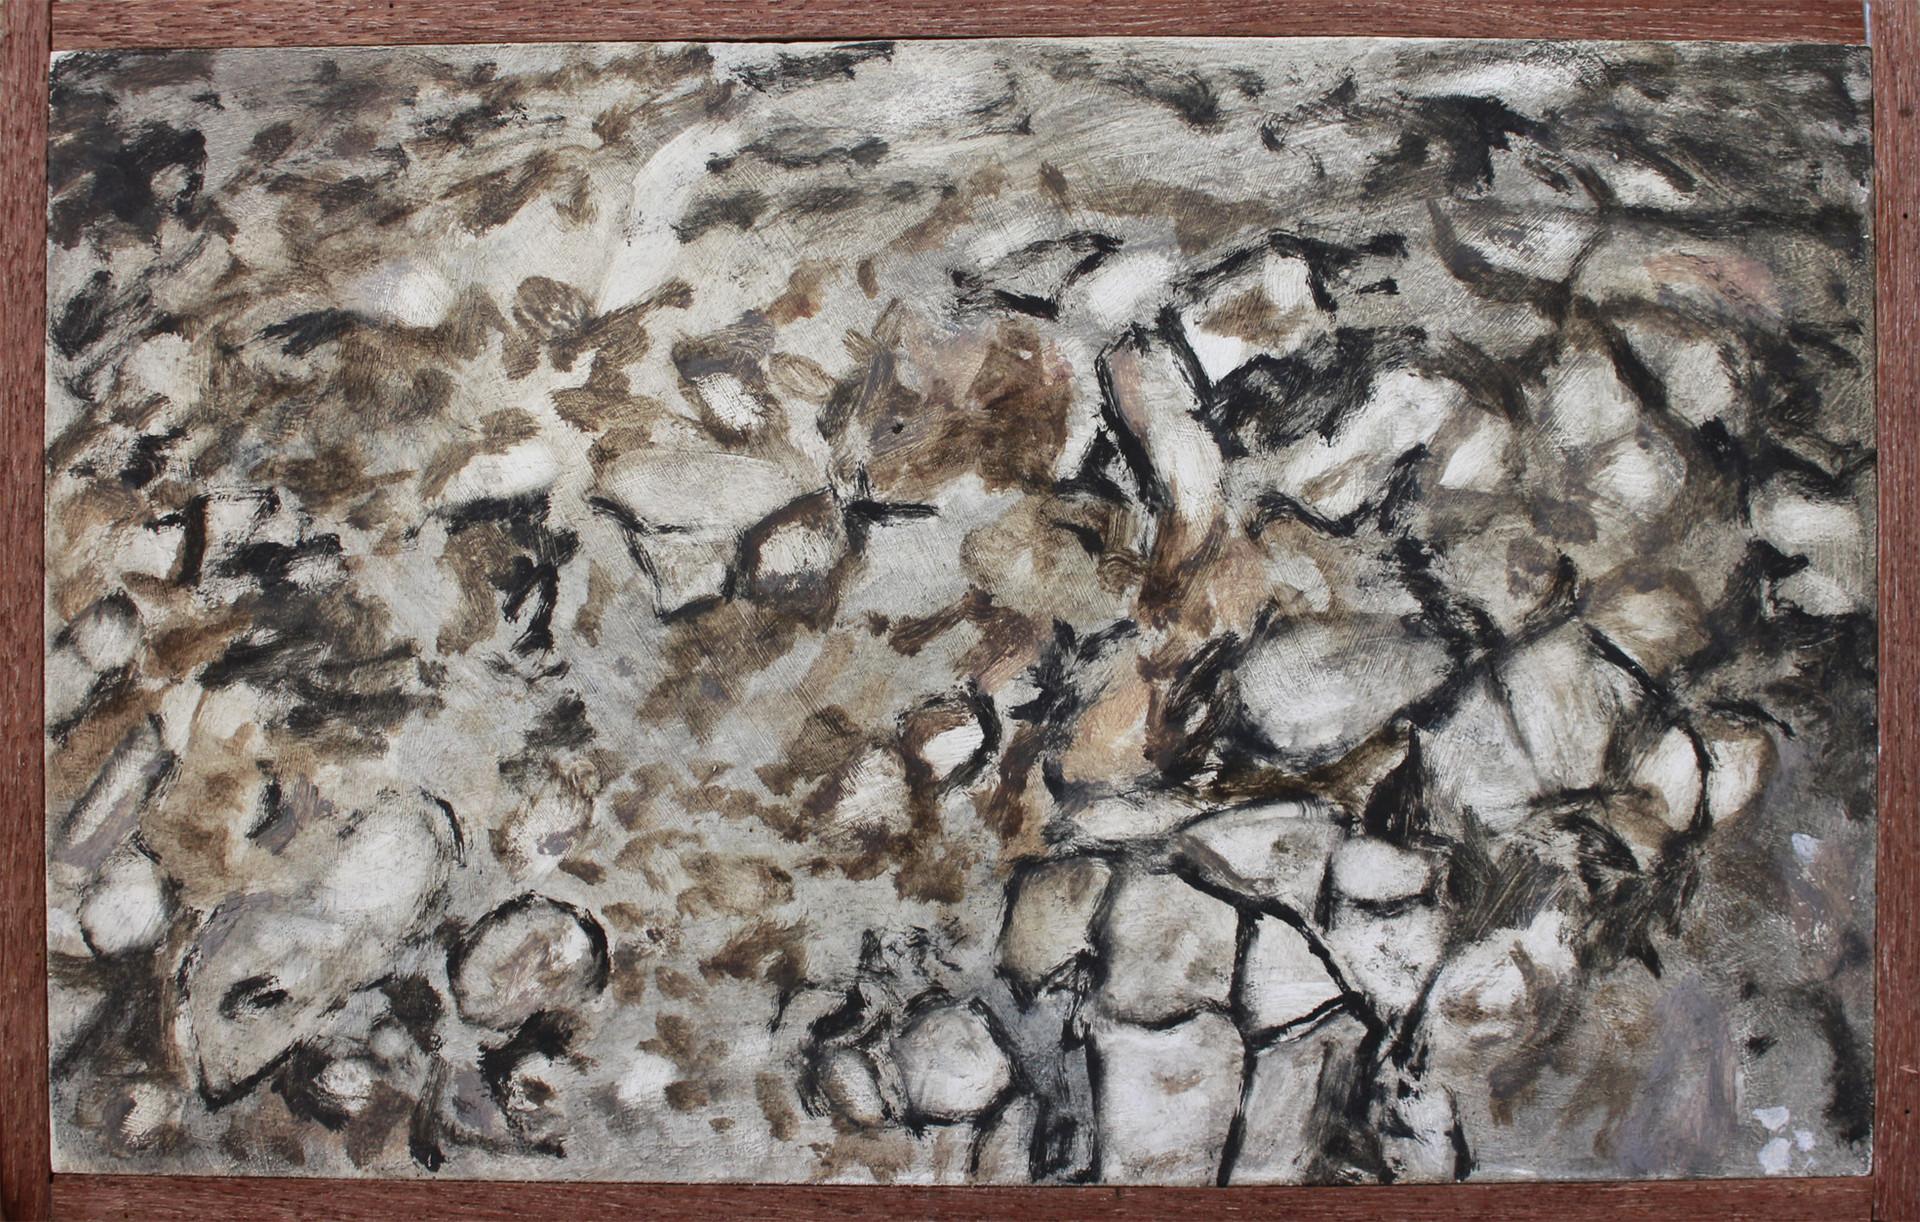 Gruis [gravel] 2015